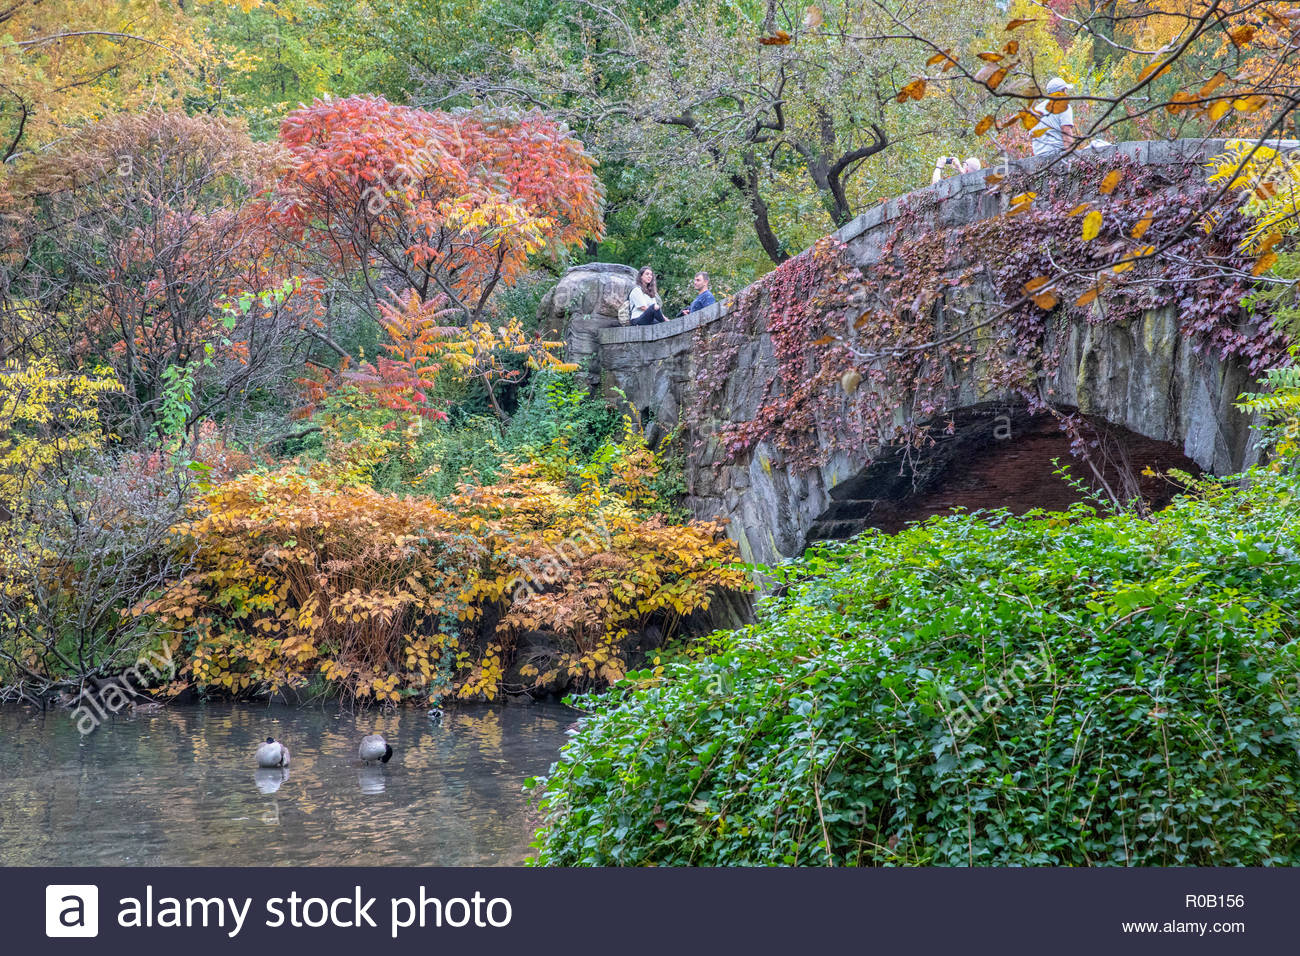 Gapstow Bridge with fall foliage, NYC, USA taken 2018 - Stock Image